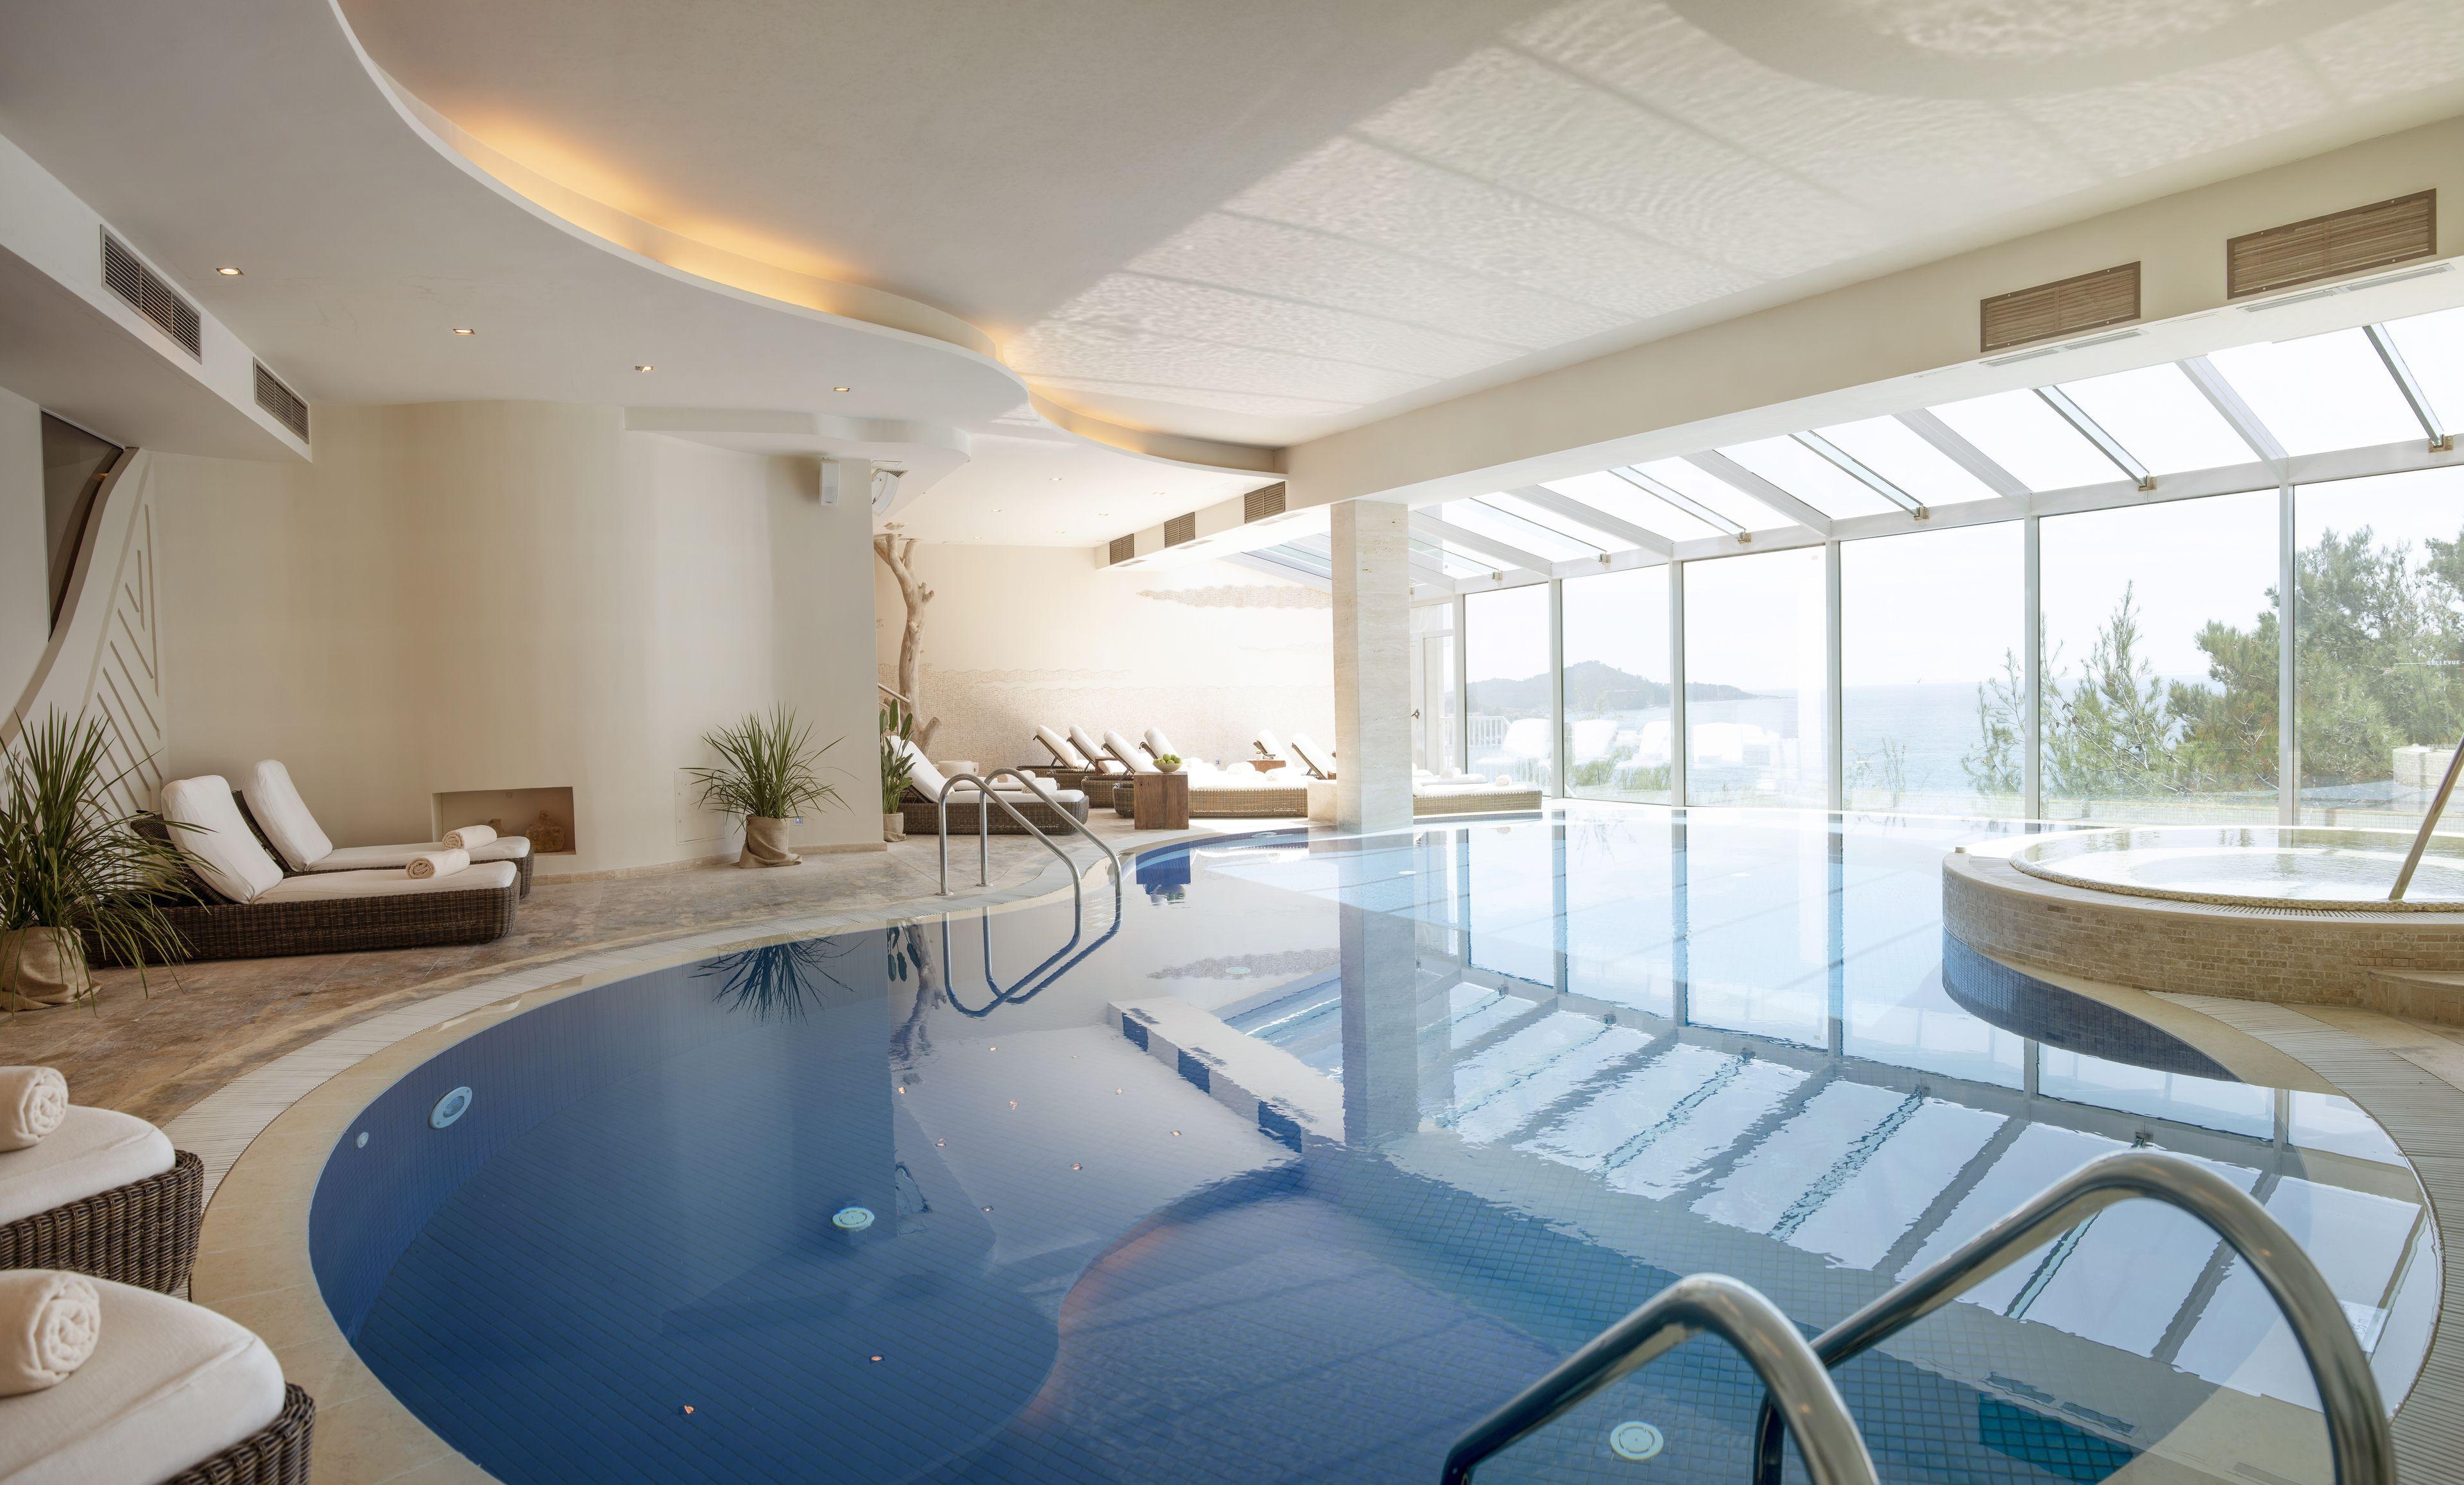 Courtesy of Hotel Bellevue Dubrovnik / Expedia